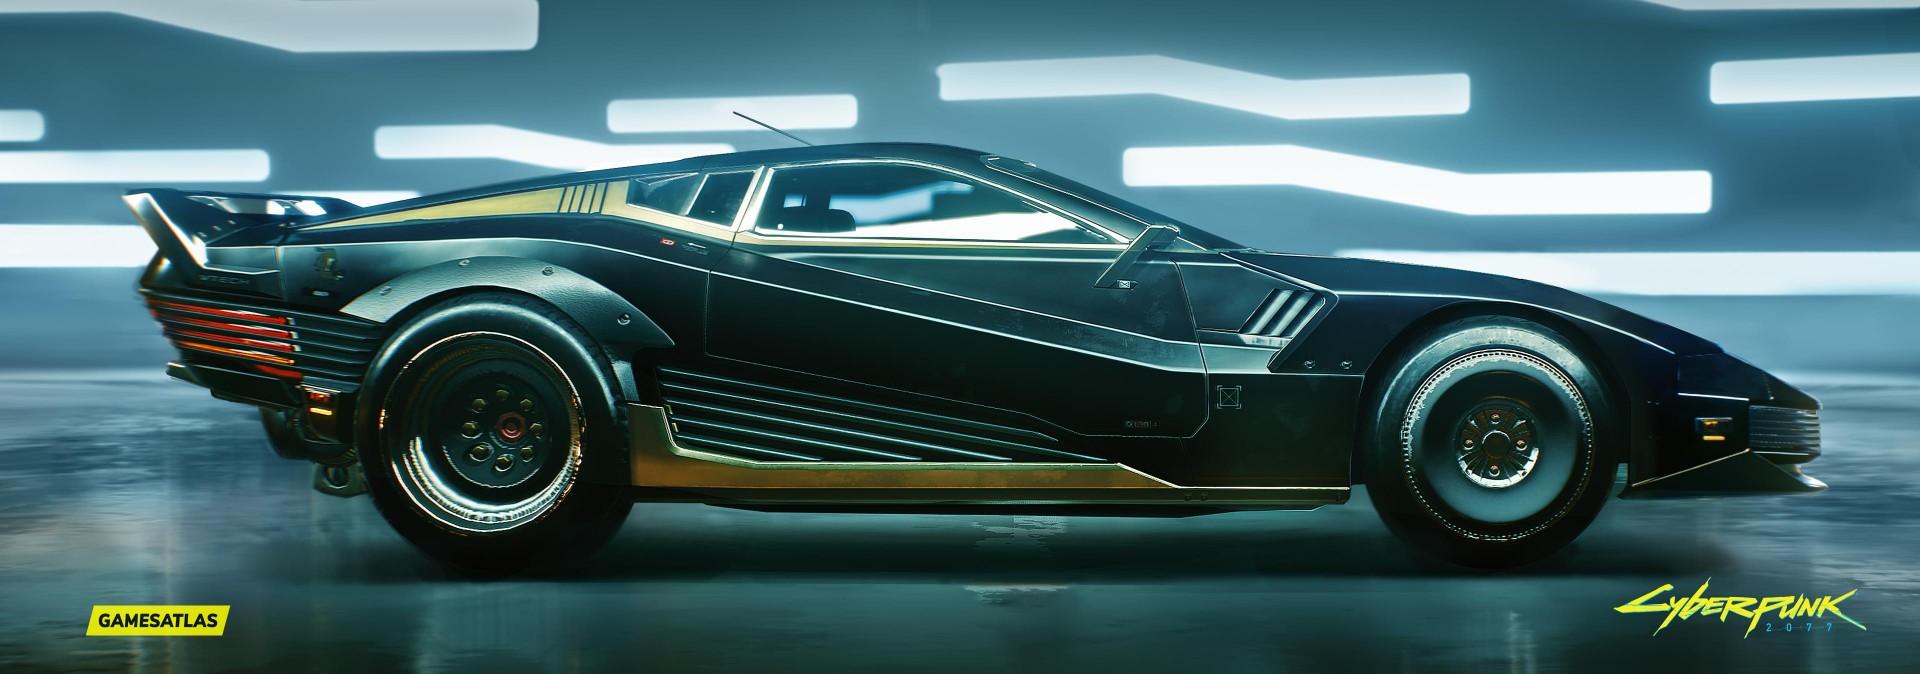 Quadra Turbo-R V-Tech Cyberpunk 2077